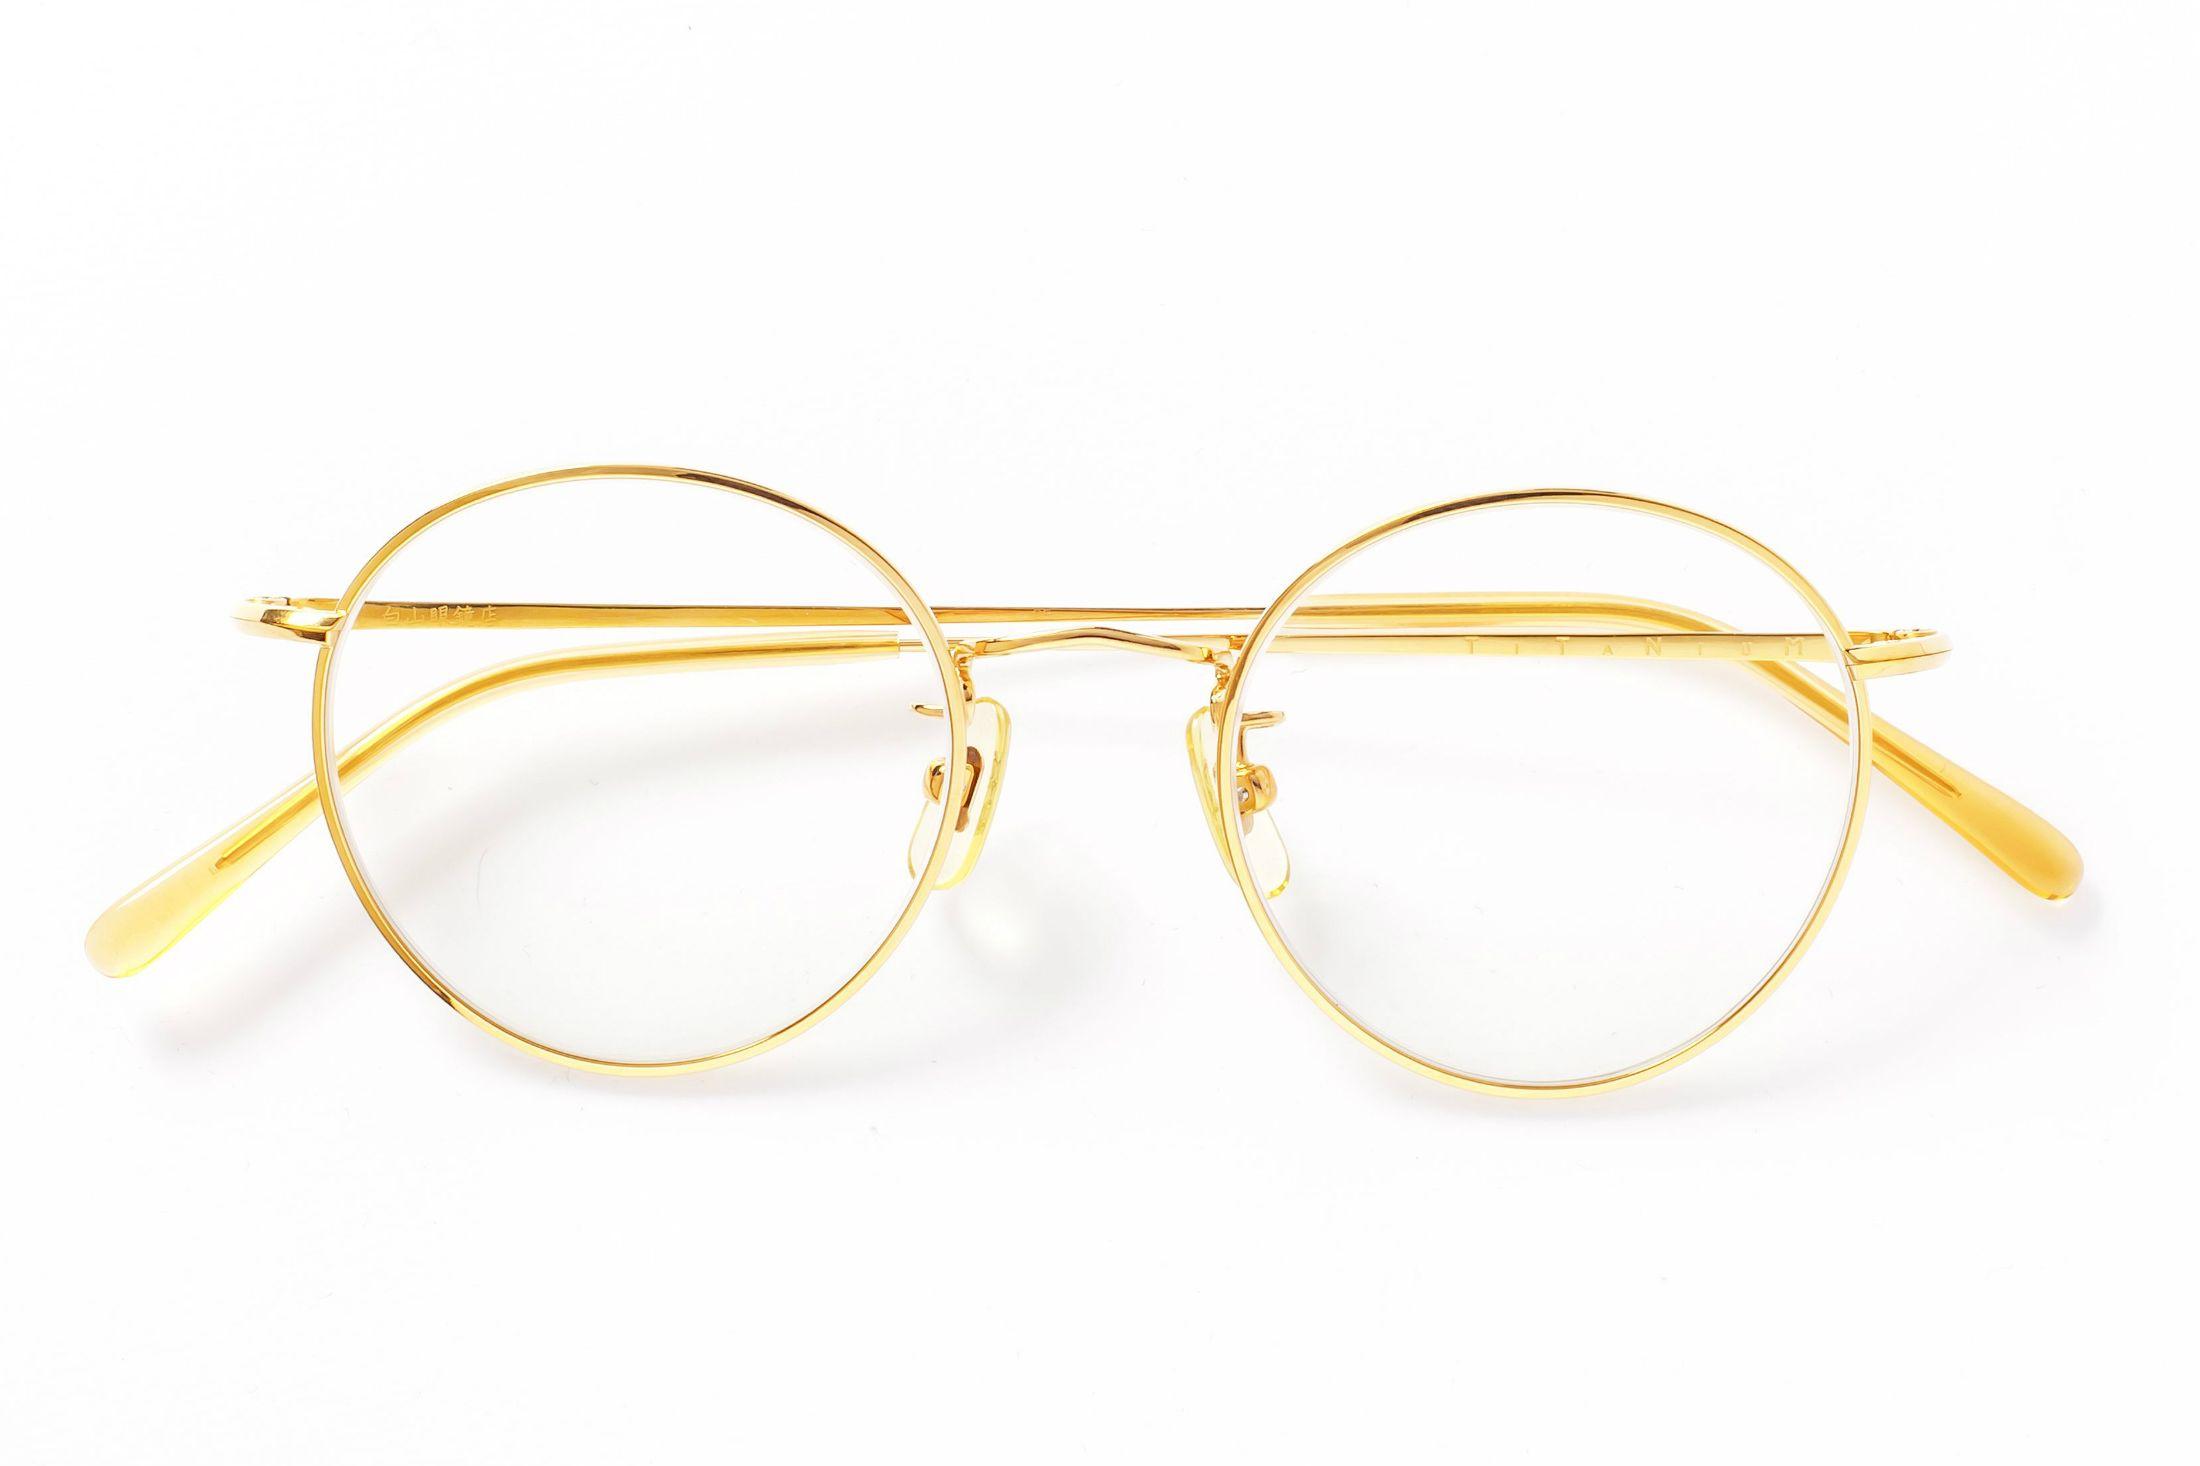 ST TITAN BOSTON|ORIGINAL FRAMES METAL|白山眼鏡店 | メガネ | Pinterest